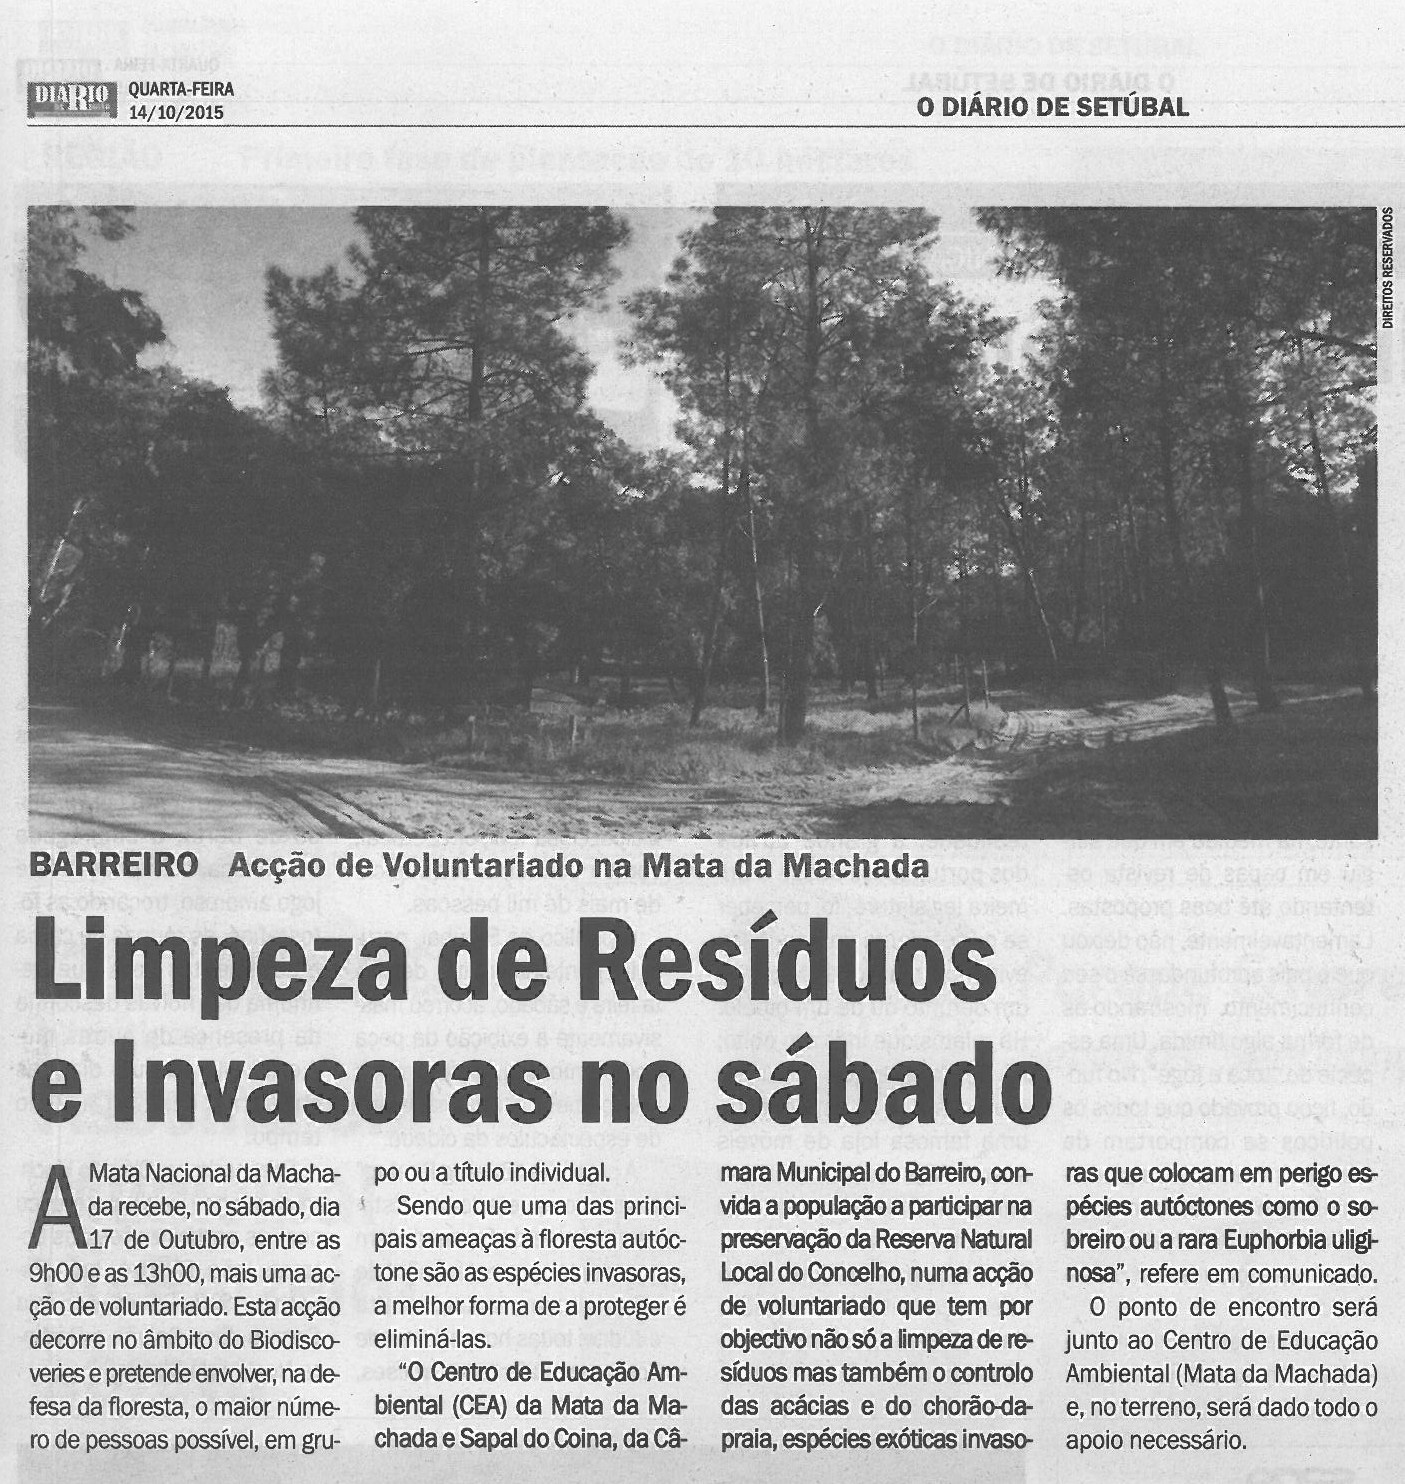 Limpeza_de_Invasoras_e_resíduos_no_Sábado_O_Diário_de_Setúbal_14102015.jpg